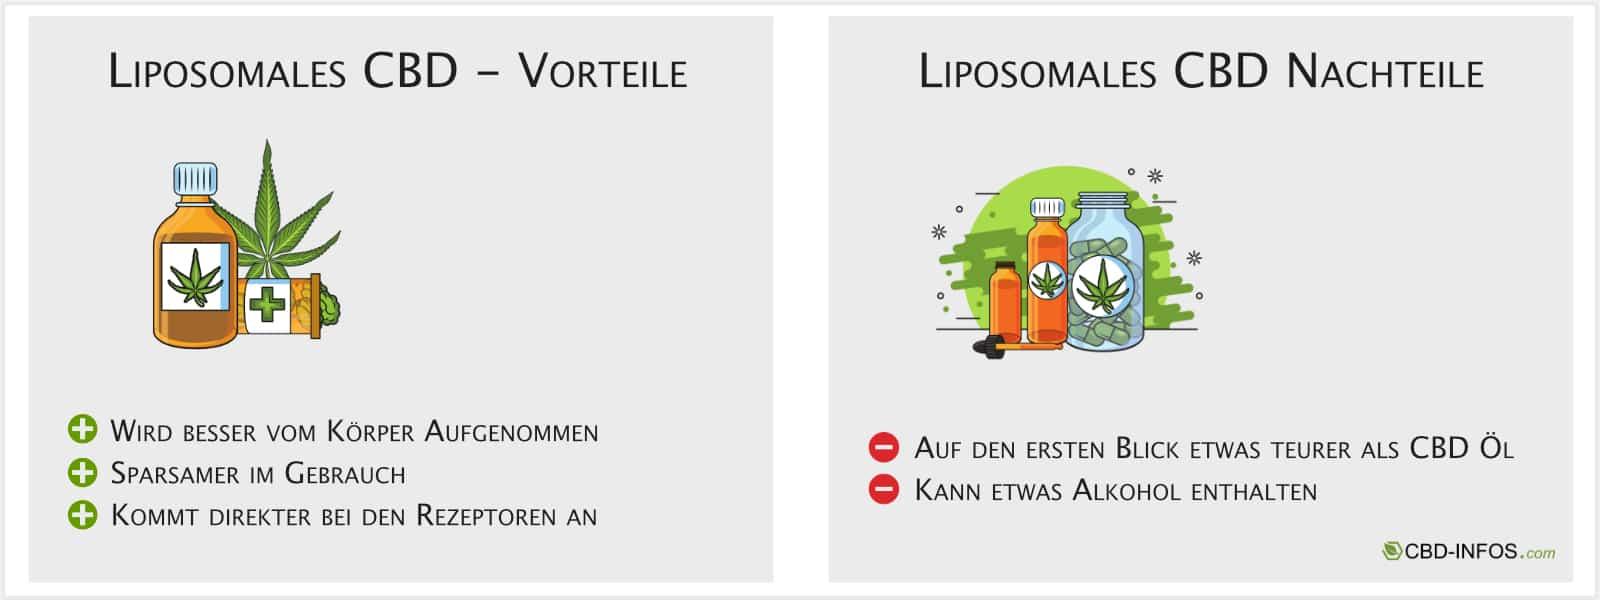 Infografik Liposomales CBD